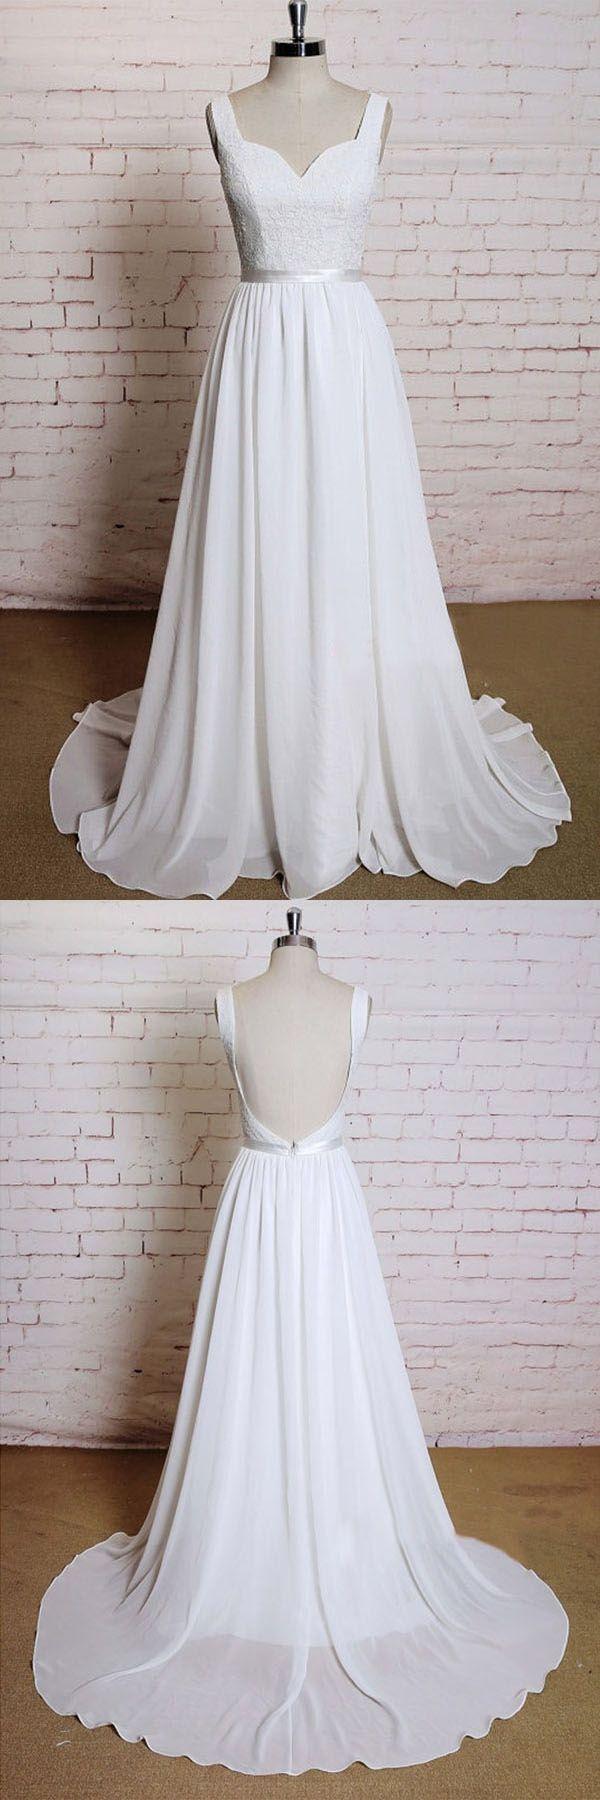 prom dresses white prom dresses long prom dresses